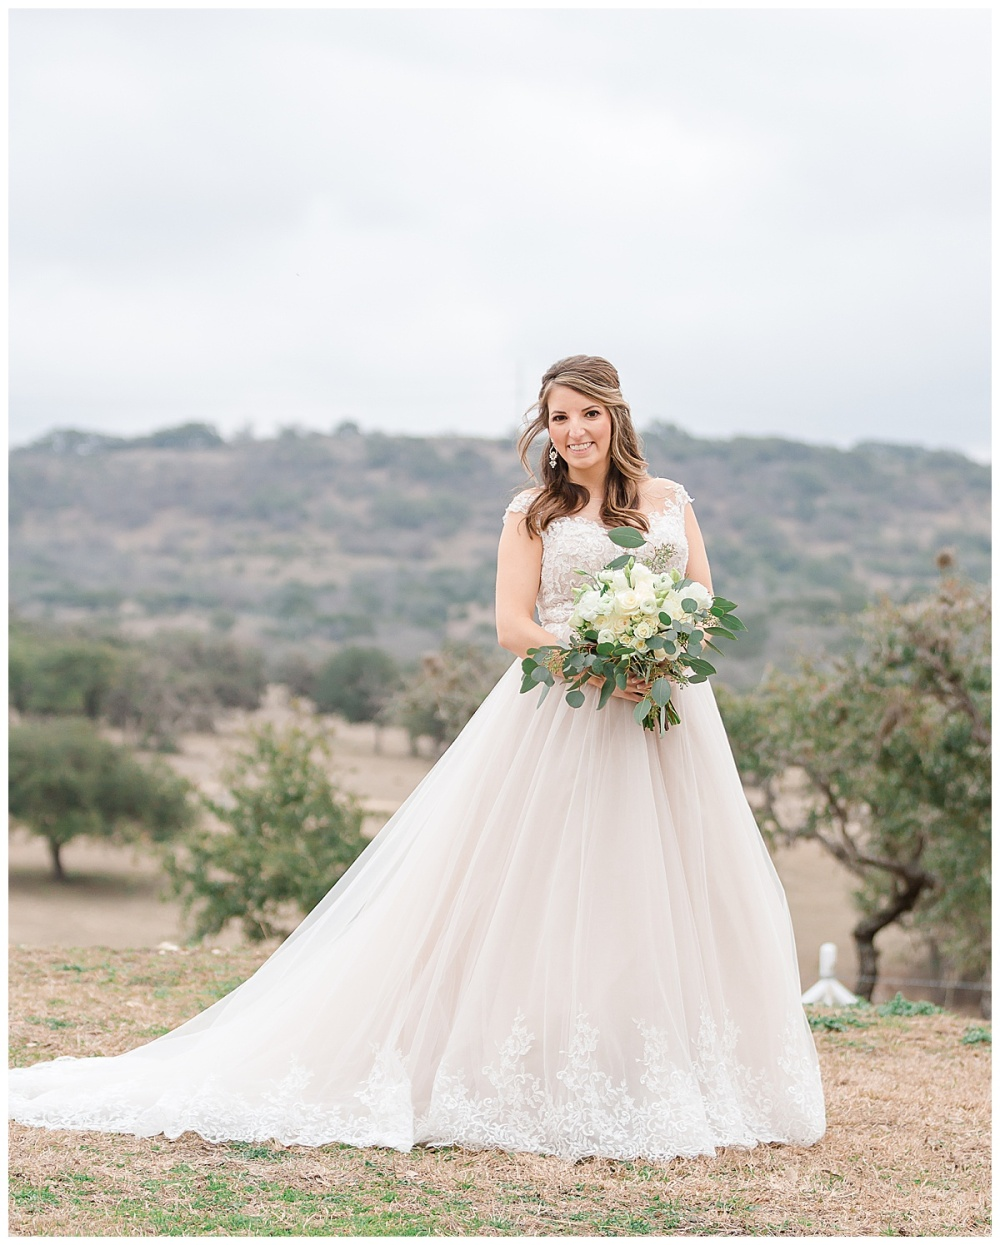 Wedding-Photographer-Texas-Hill-Country-Happy-H-Ranch-Comfor-Texas-Carly-Barton-Photography_0060.jpg